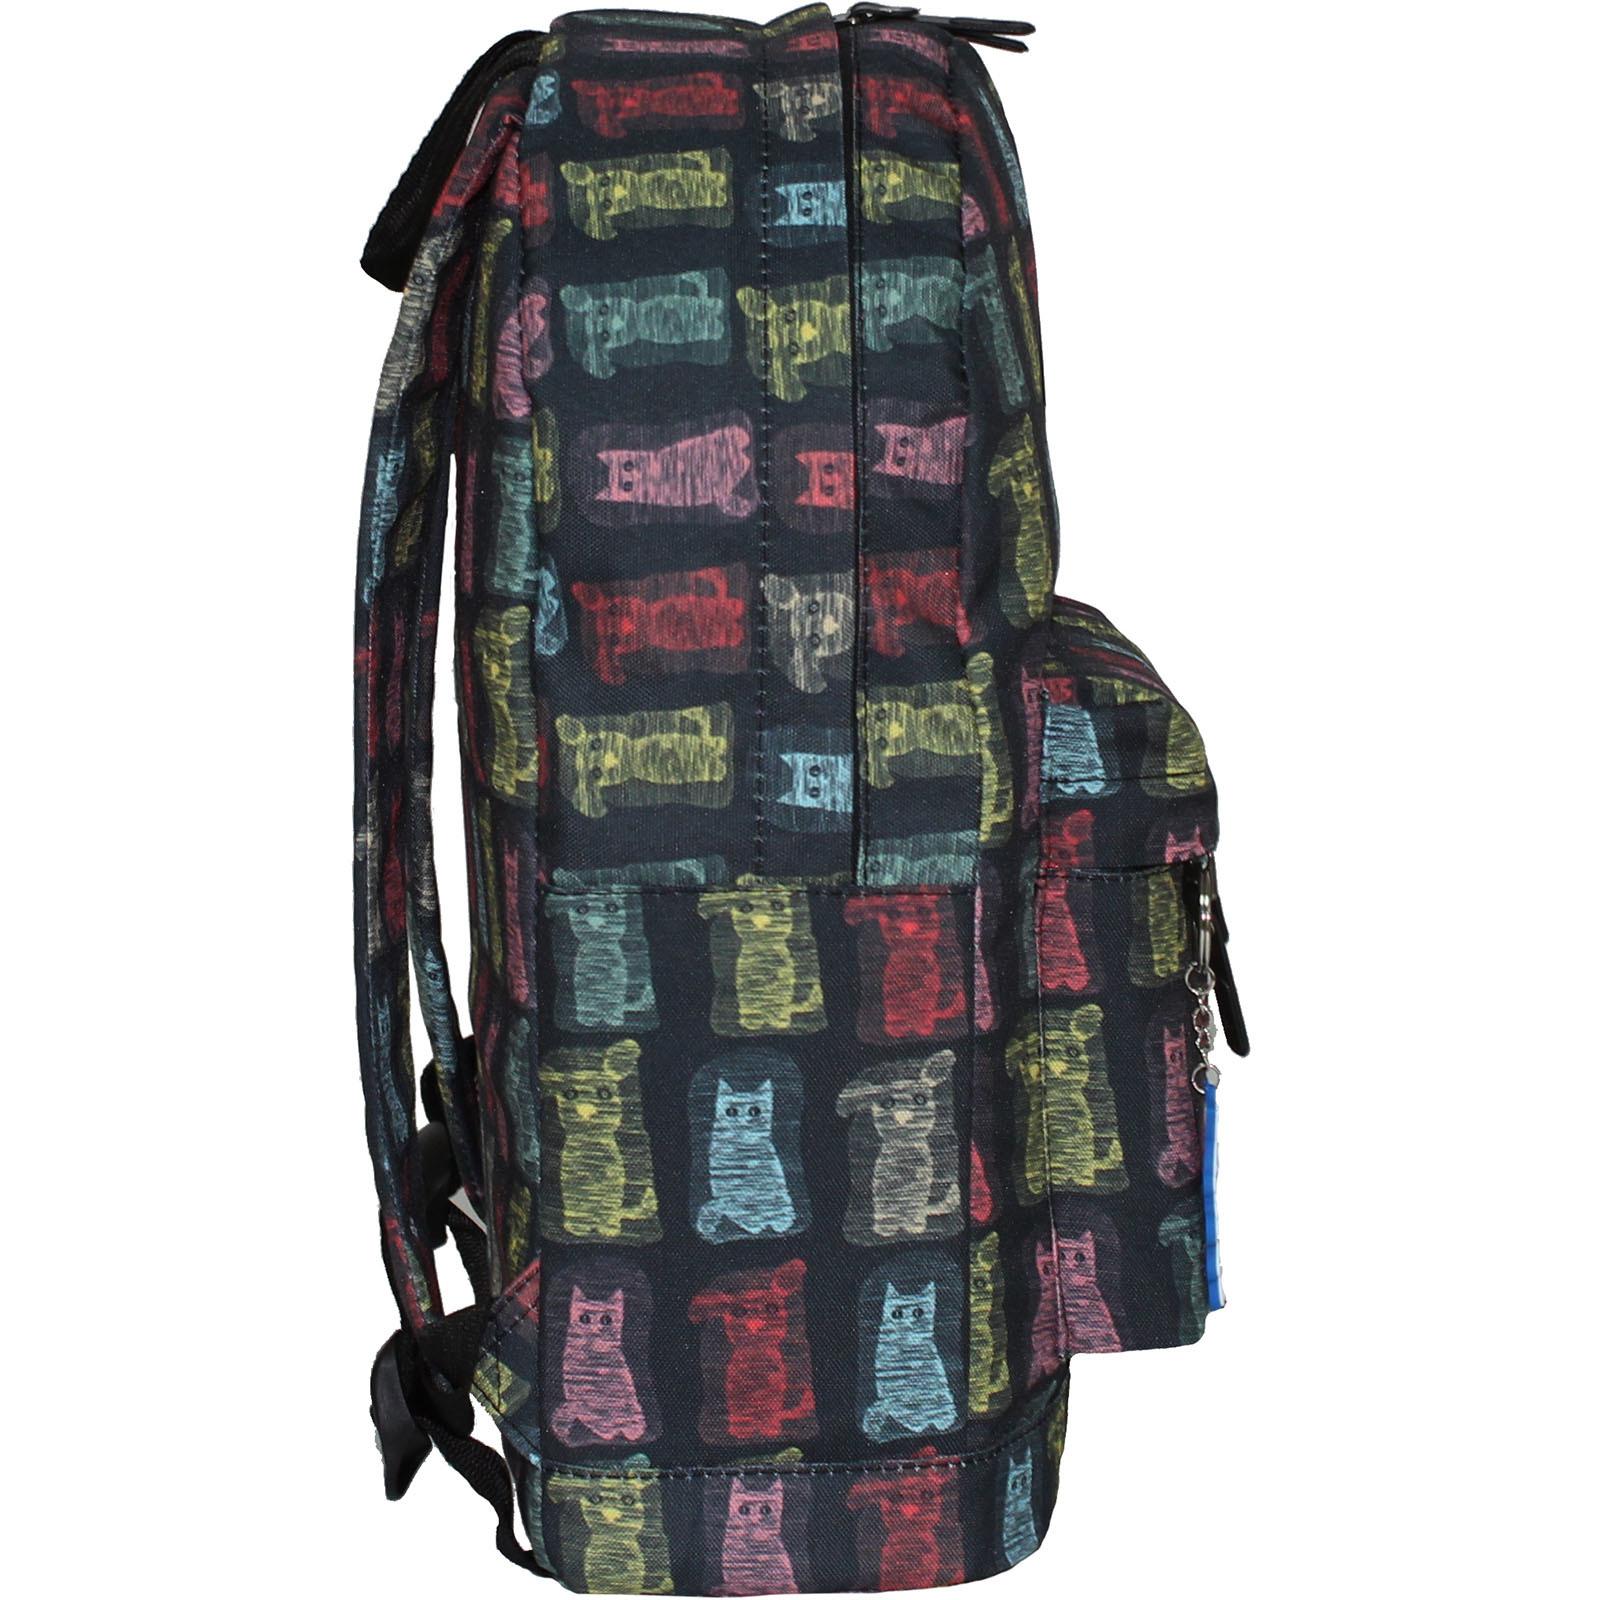 Рюкзак Bagland Молодежный (дизайн) 17 л. сублимация 189 (00533664)